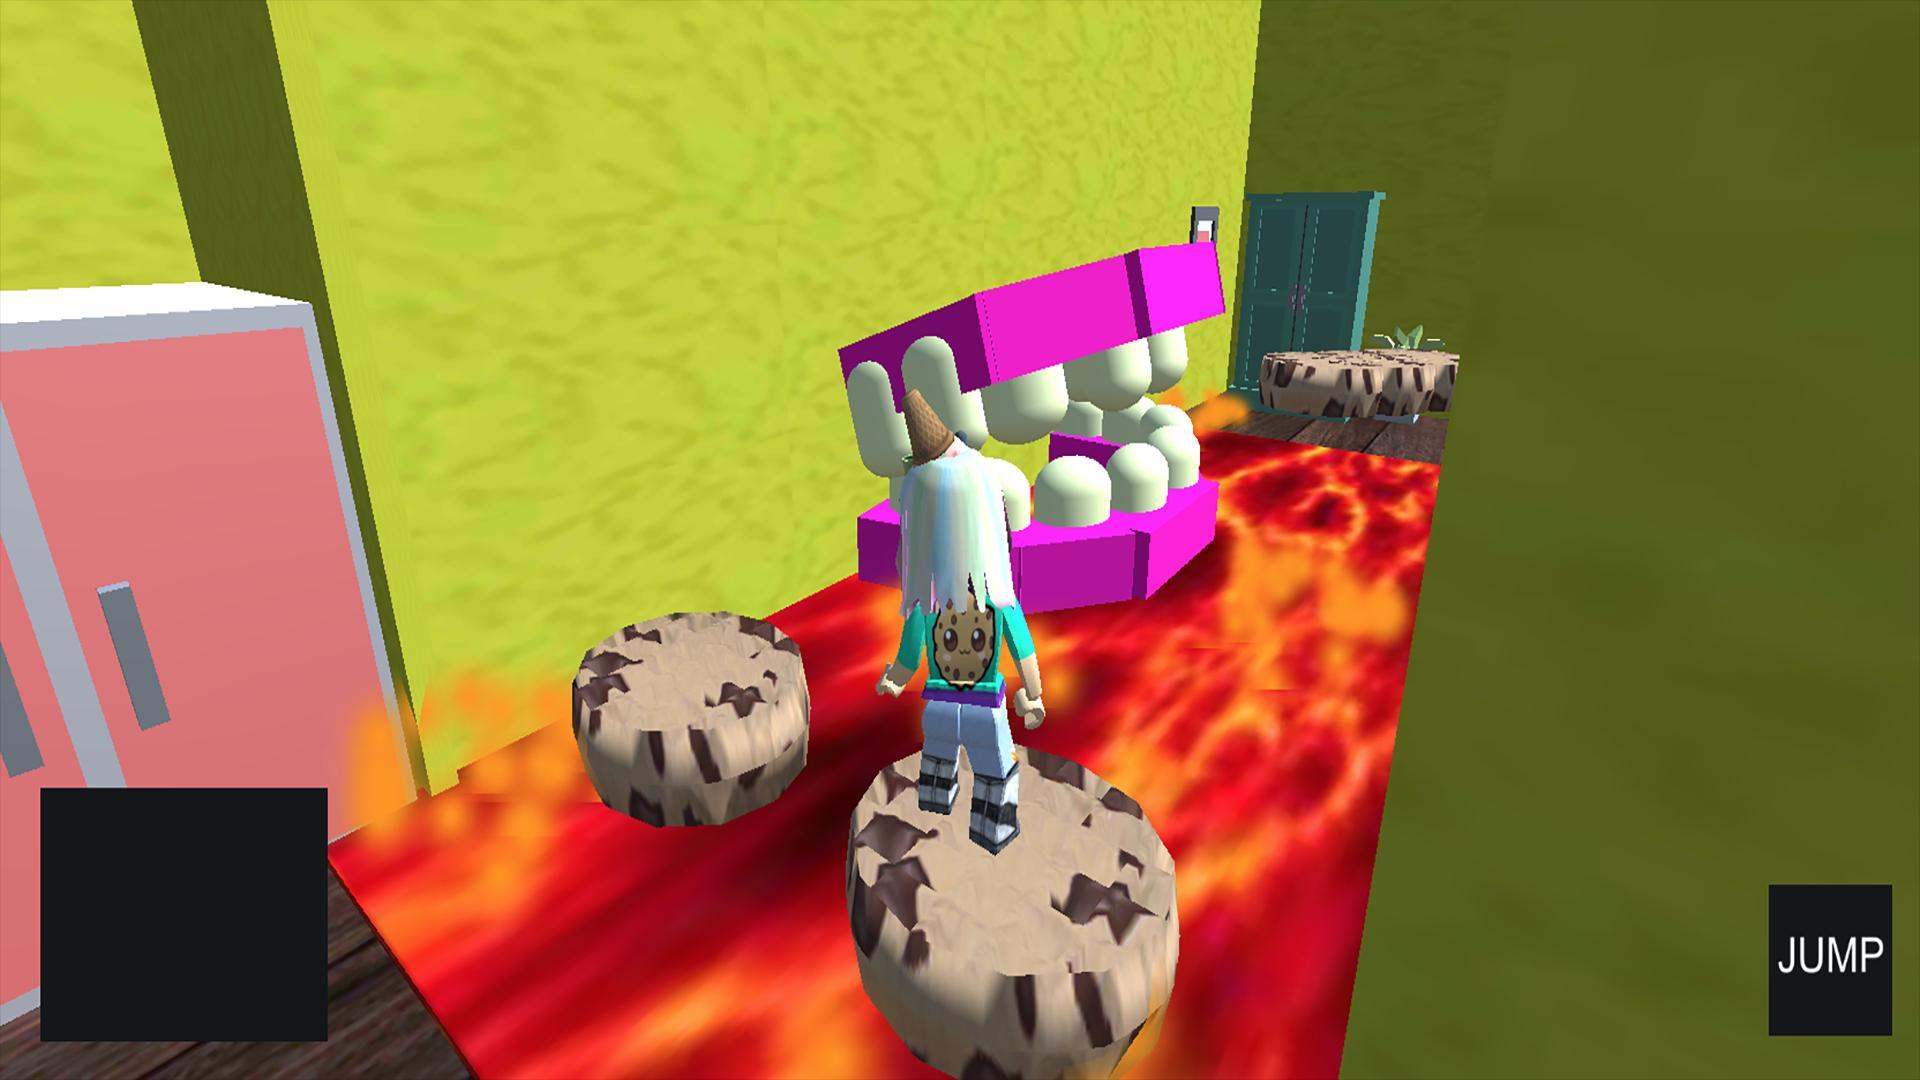 Crazy cookie swirl c robIox adventure 1.2 Screenshot 4